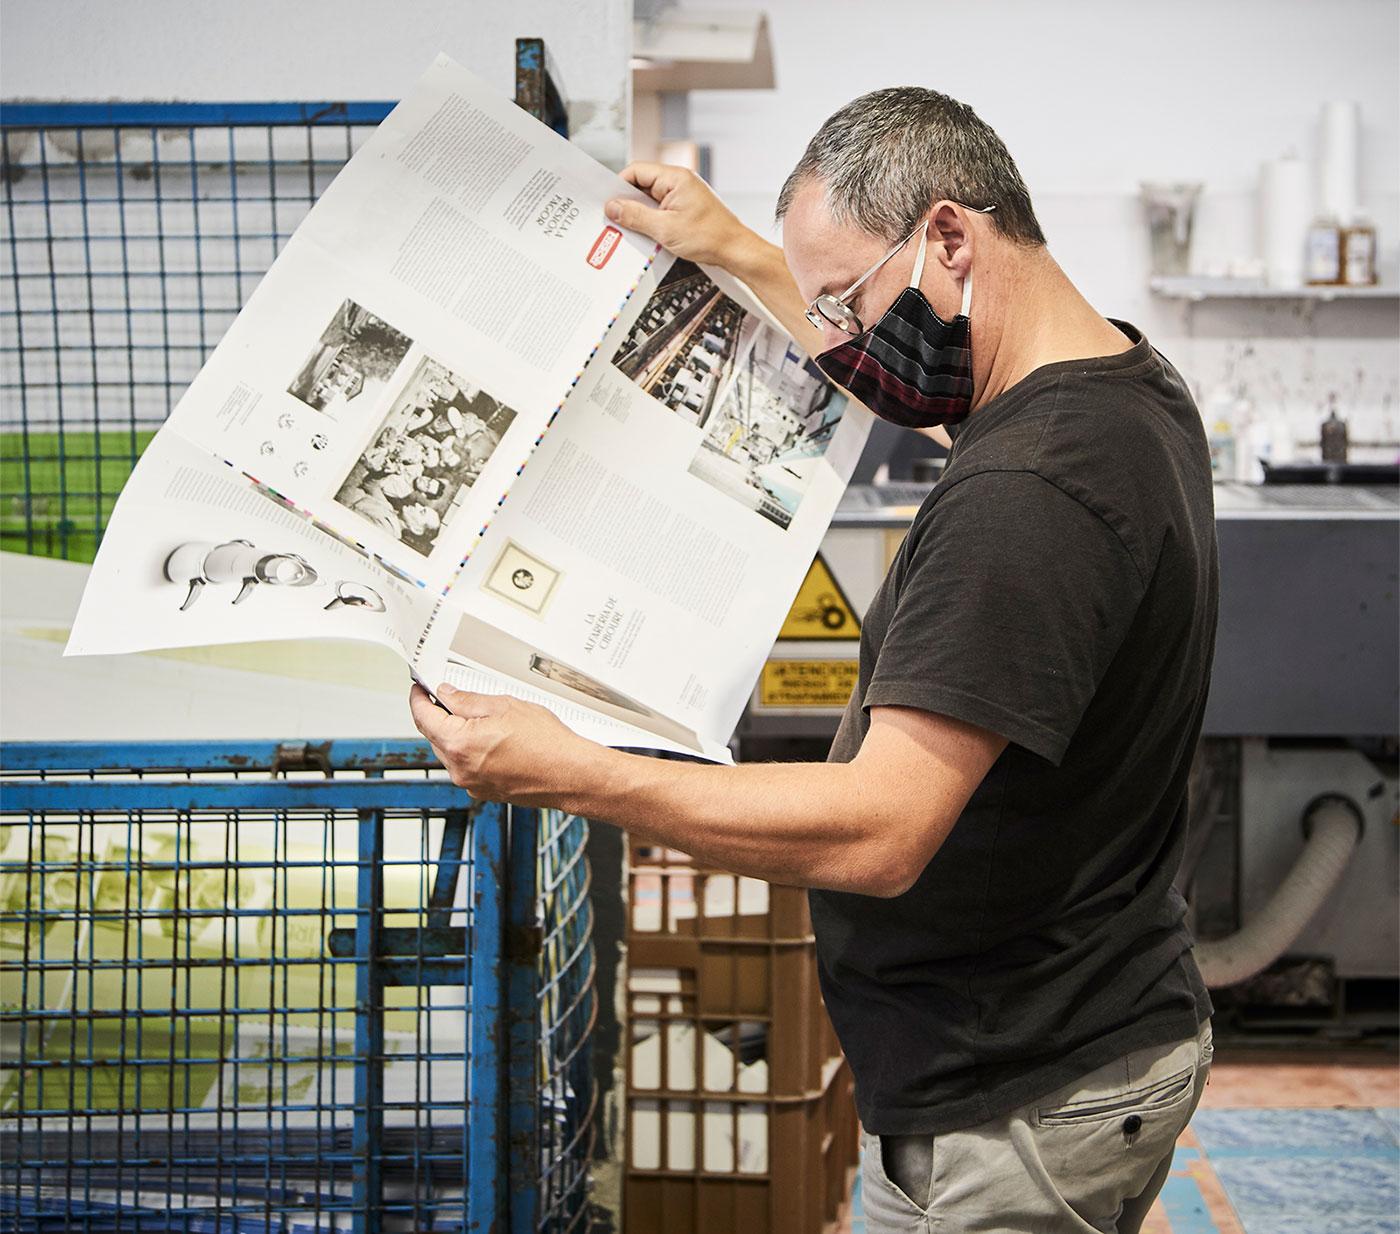 Jean Louis Iratzoki verifying the printing of Hemendik book